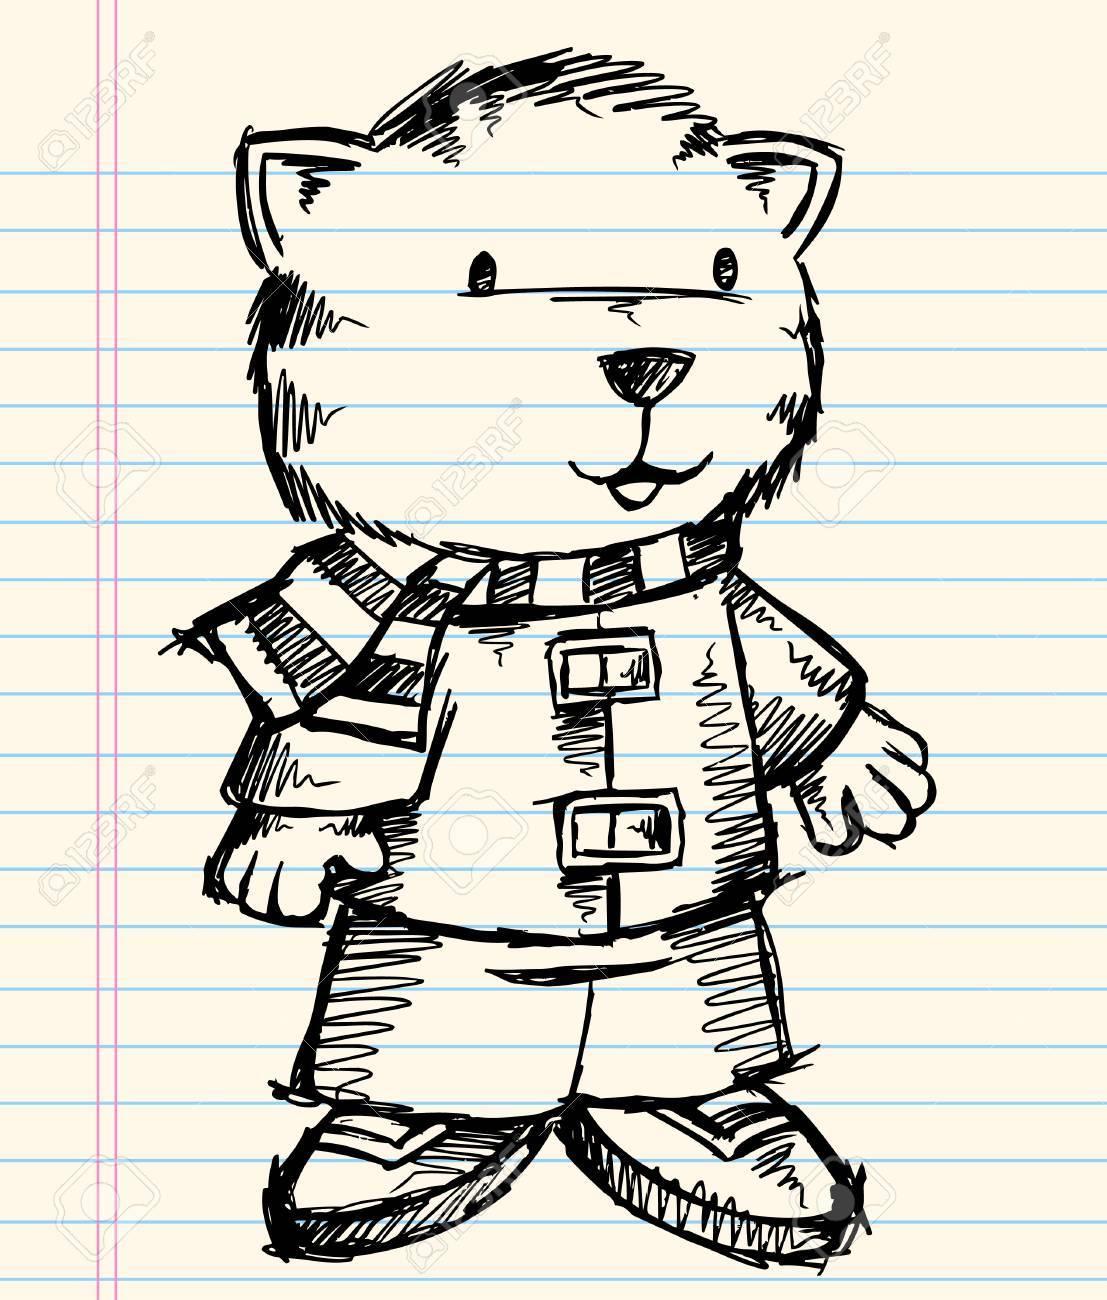 Notebook Doodle Sketch Tigre Vecteur De Vacances Art Illustration De ...